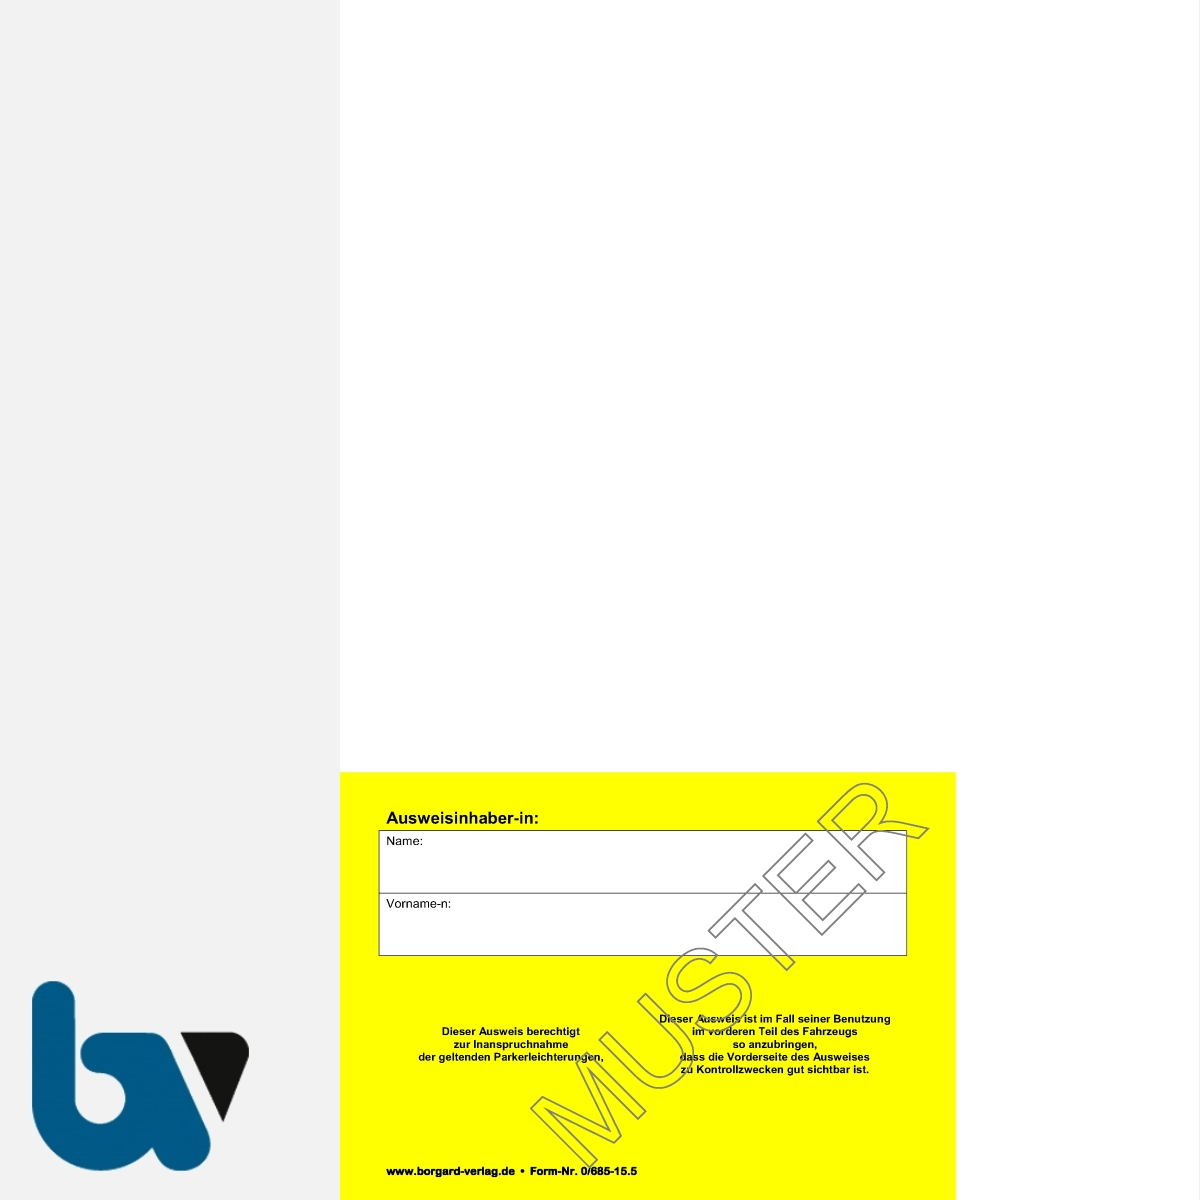 0/685-15.5 Parkausweis zur Ausnahmegenehmigung Parkerleichterungen Sonderregelung RP SH MV gelb Modell behinderte Menschen DIN A4 perforiert RS   Borgard Verlag GmbH